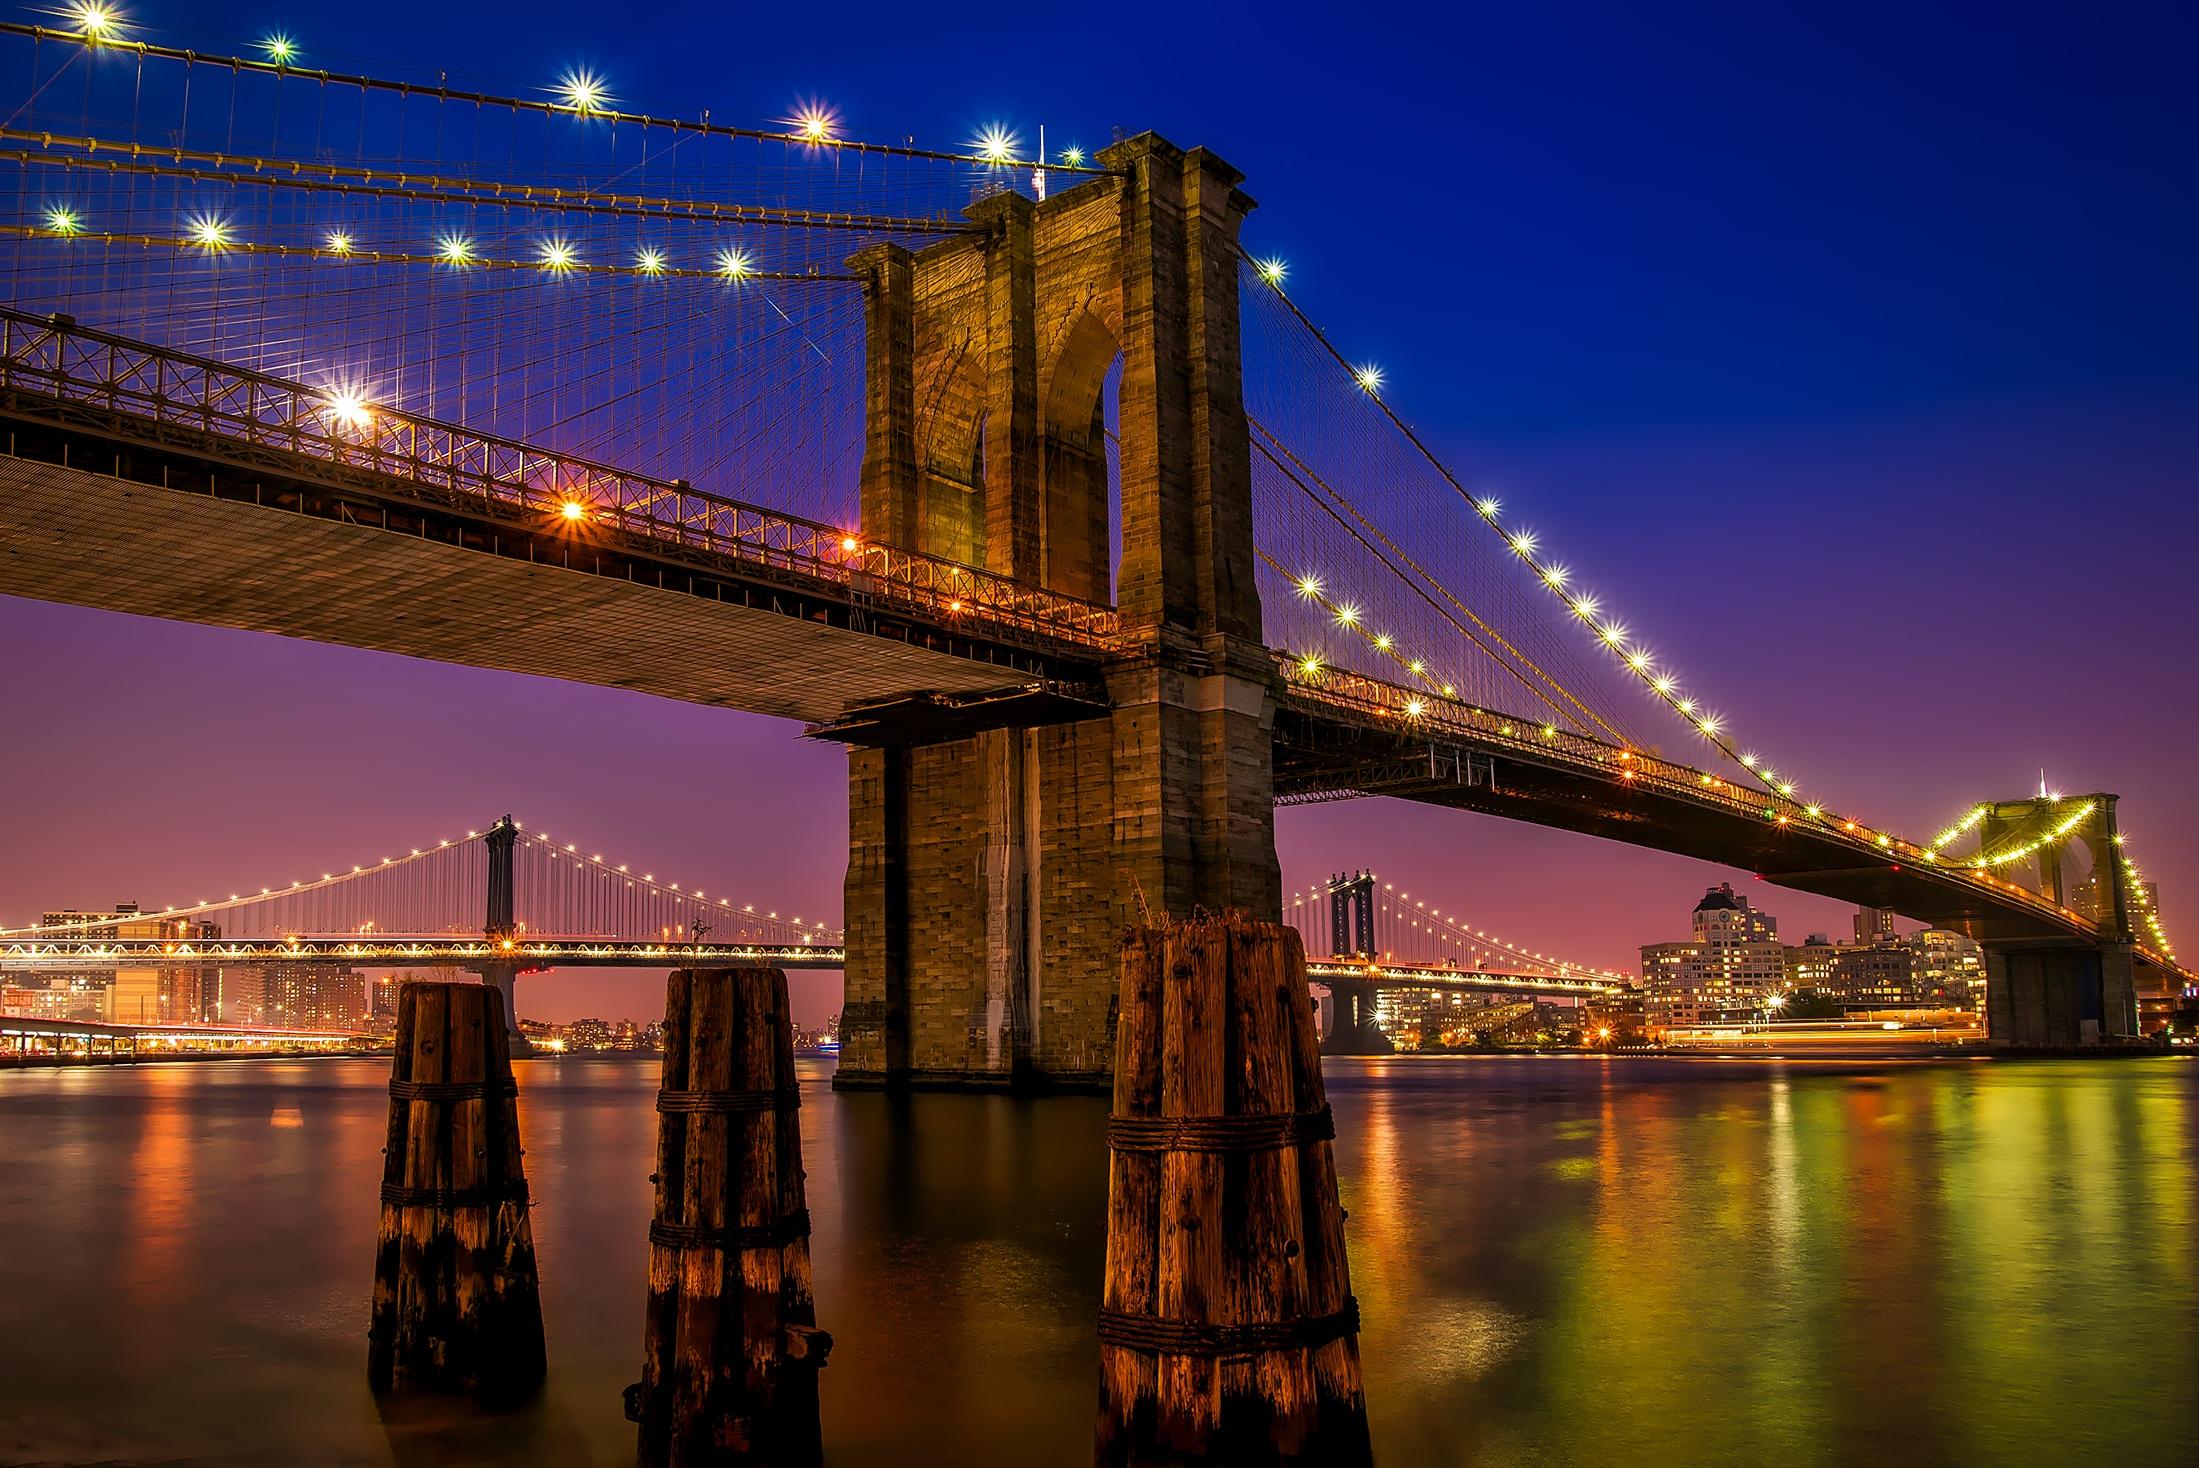 free images water architecture sunset skyline night urban